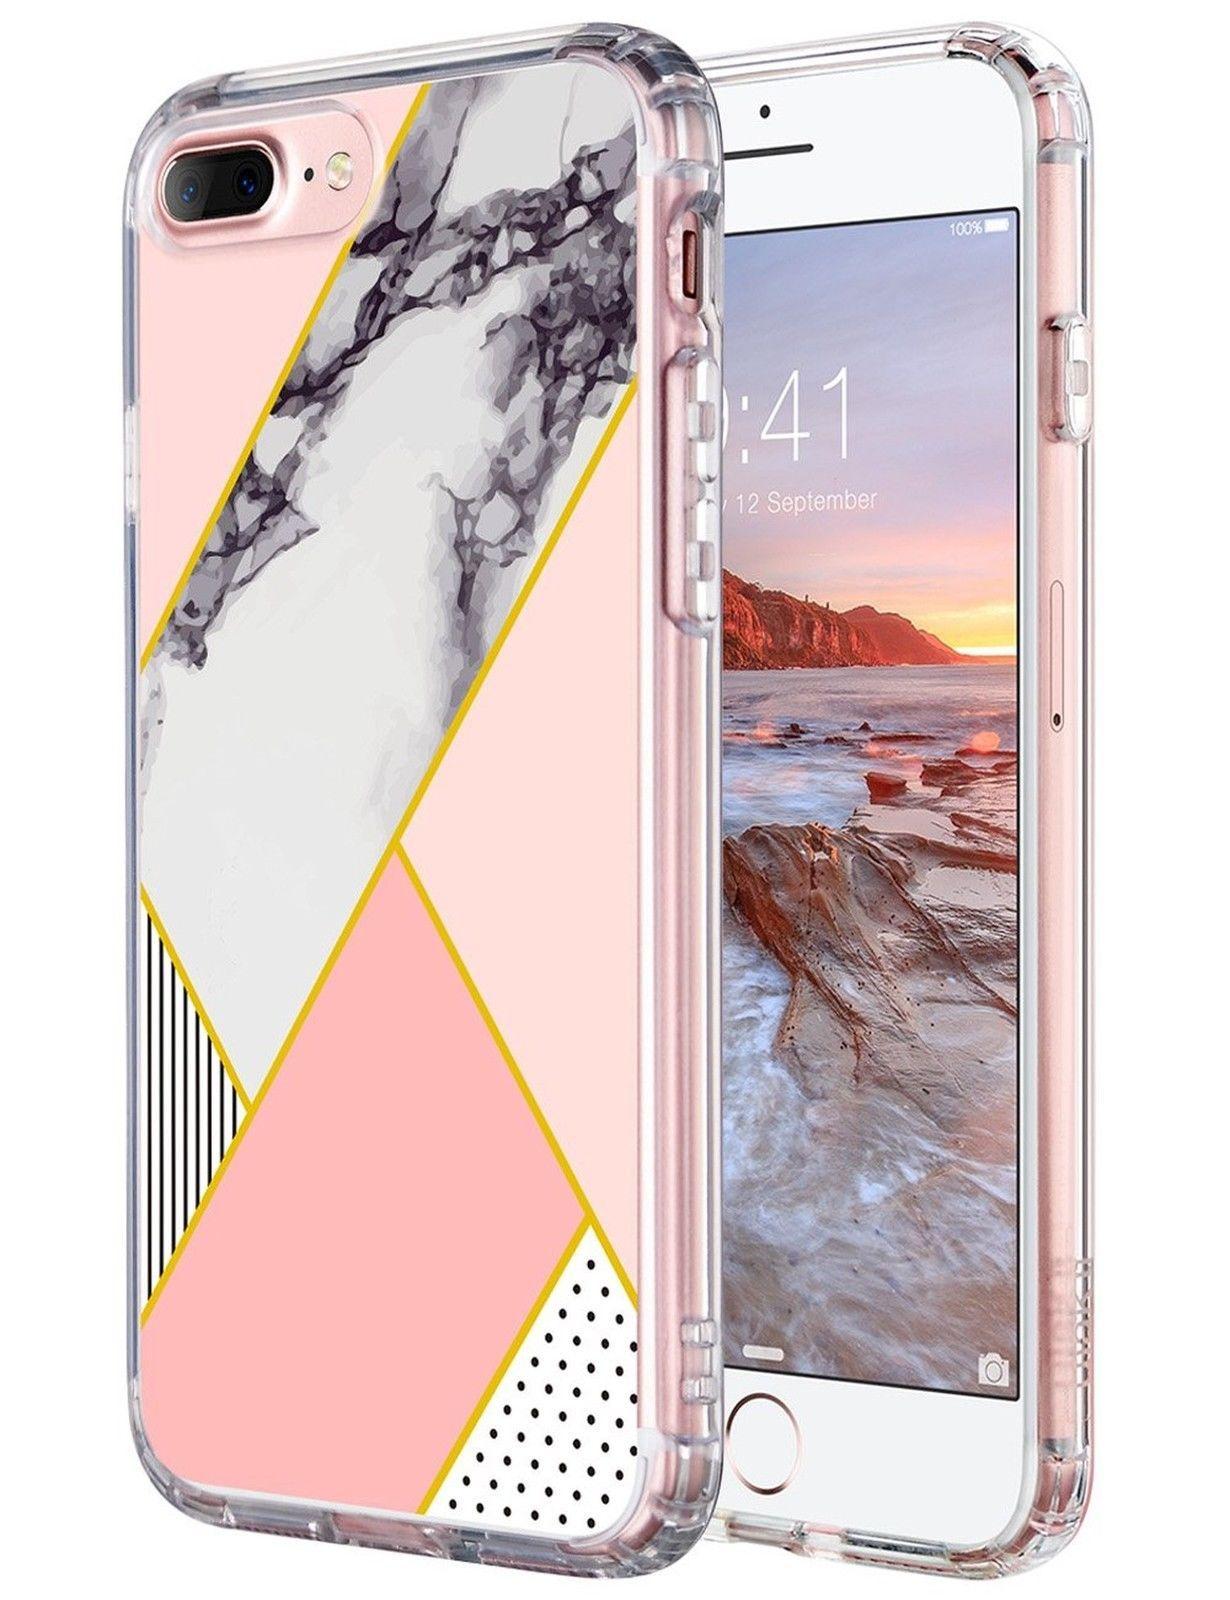 on sale 6f974 79248 iPhone 7 Plus Case ULAK [Clear Slim] Pattern Hybrid Shock Absorbing ...